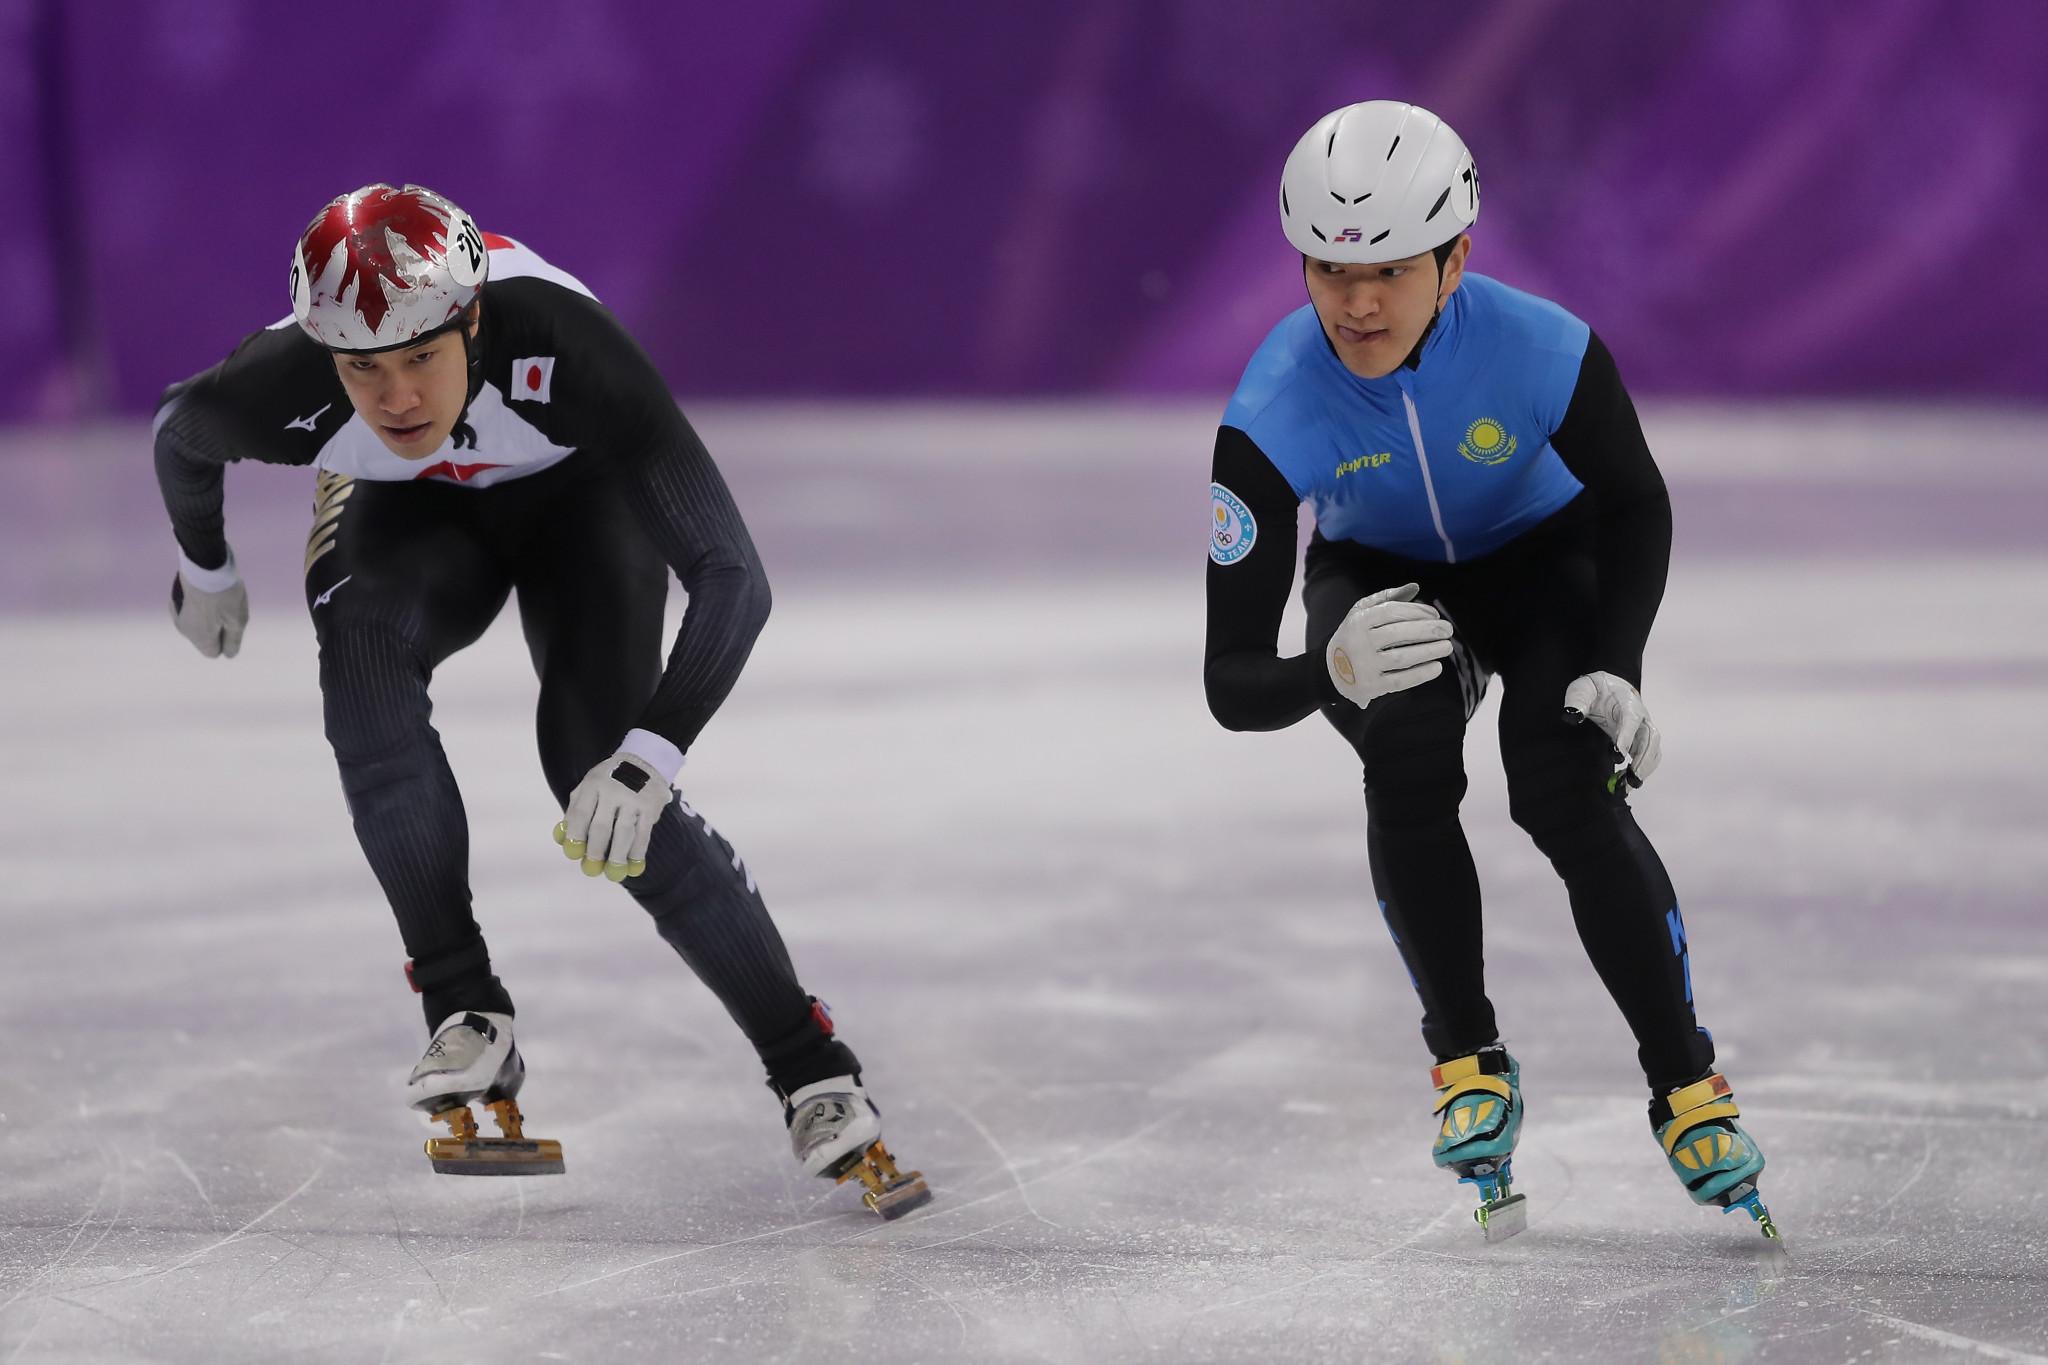 Azhgaliyev shines on day one of ISU Short Track Speed Skating World Cup